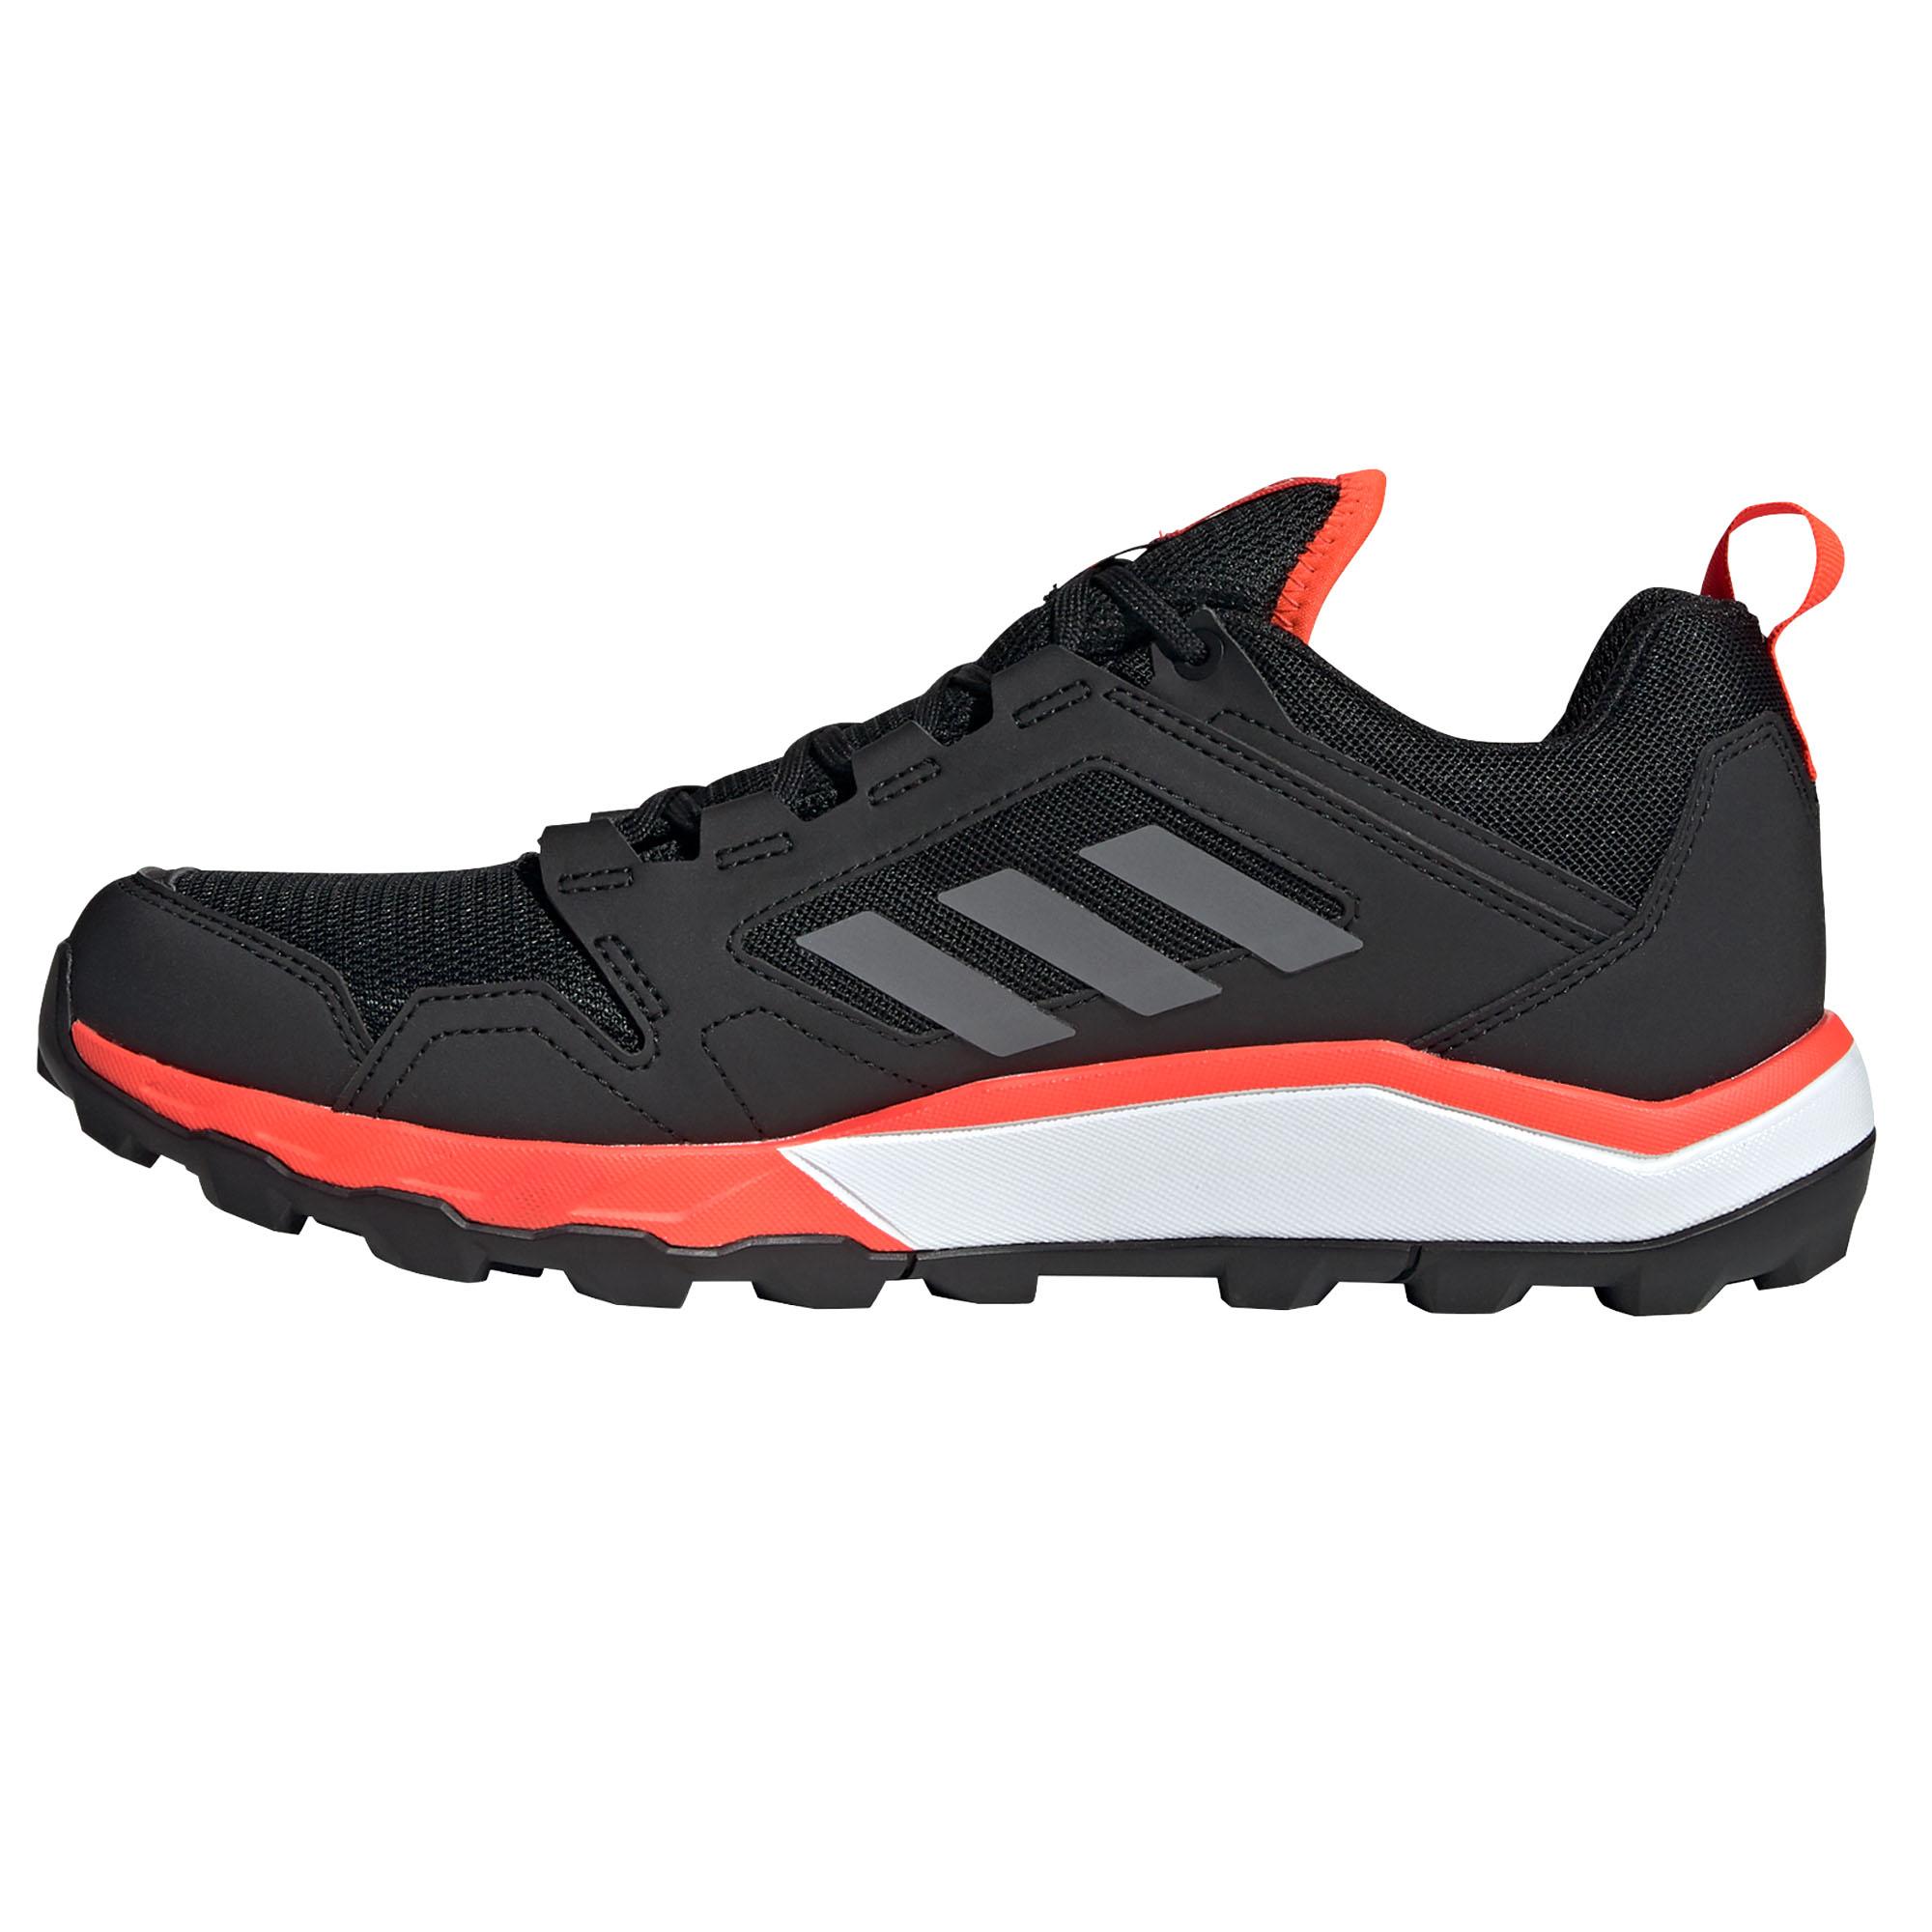 Adidas-Terrex-en-apesanteur-GTX-Homme-Trail-Running-Trainer-Shoe-Black-Red miniature 8